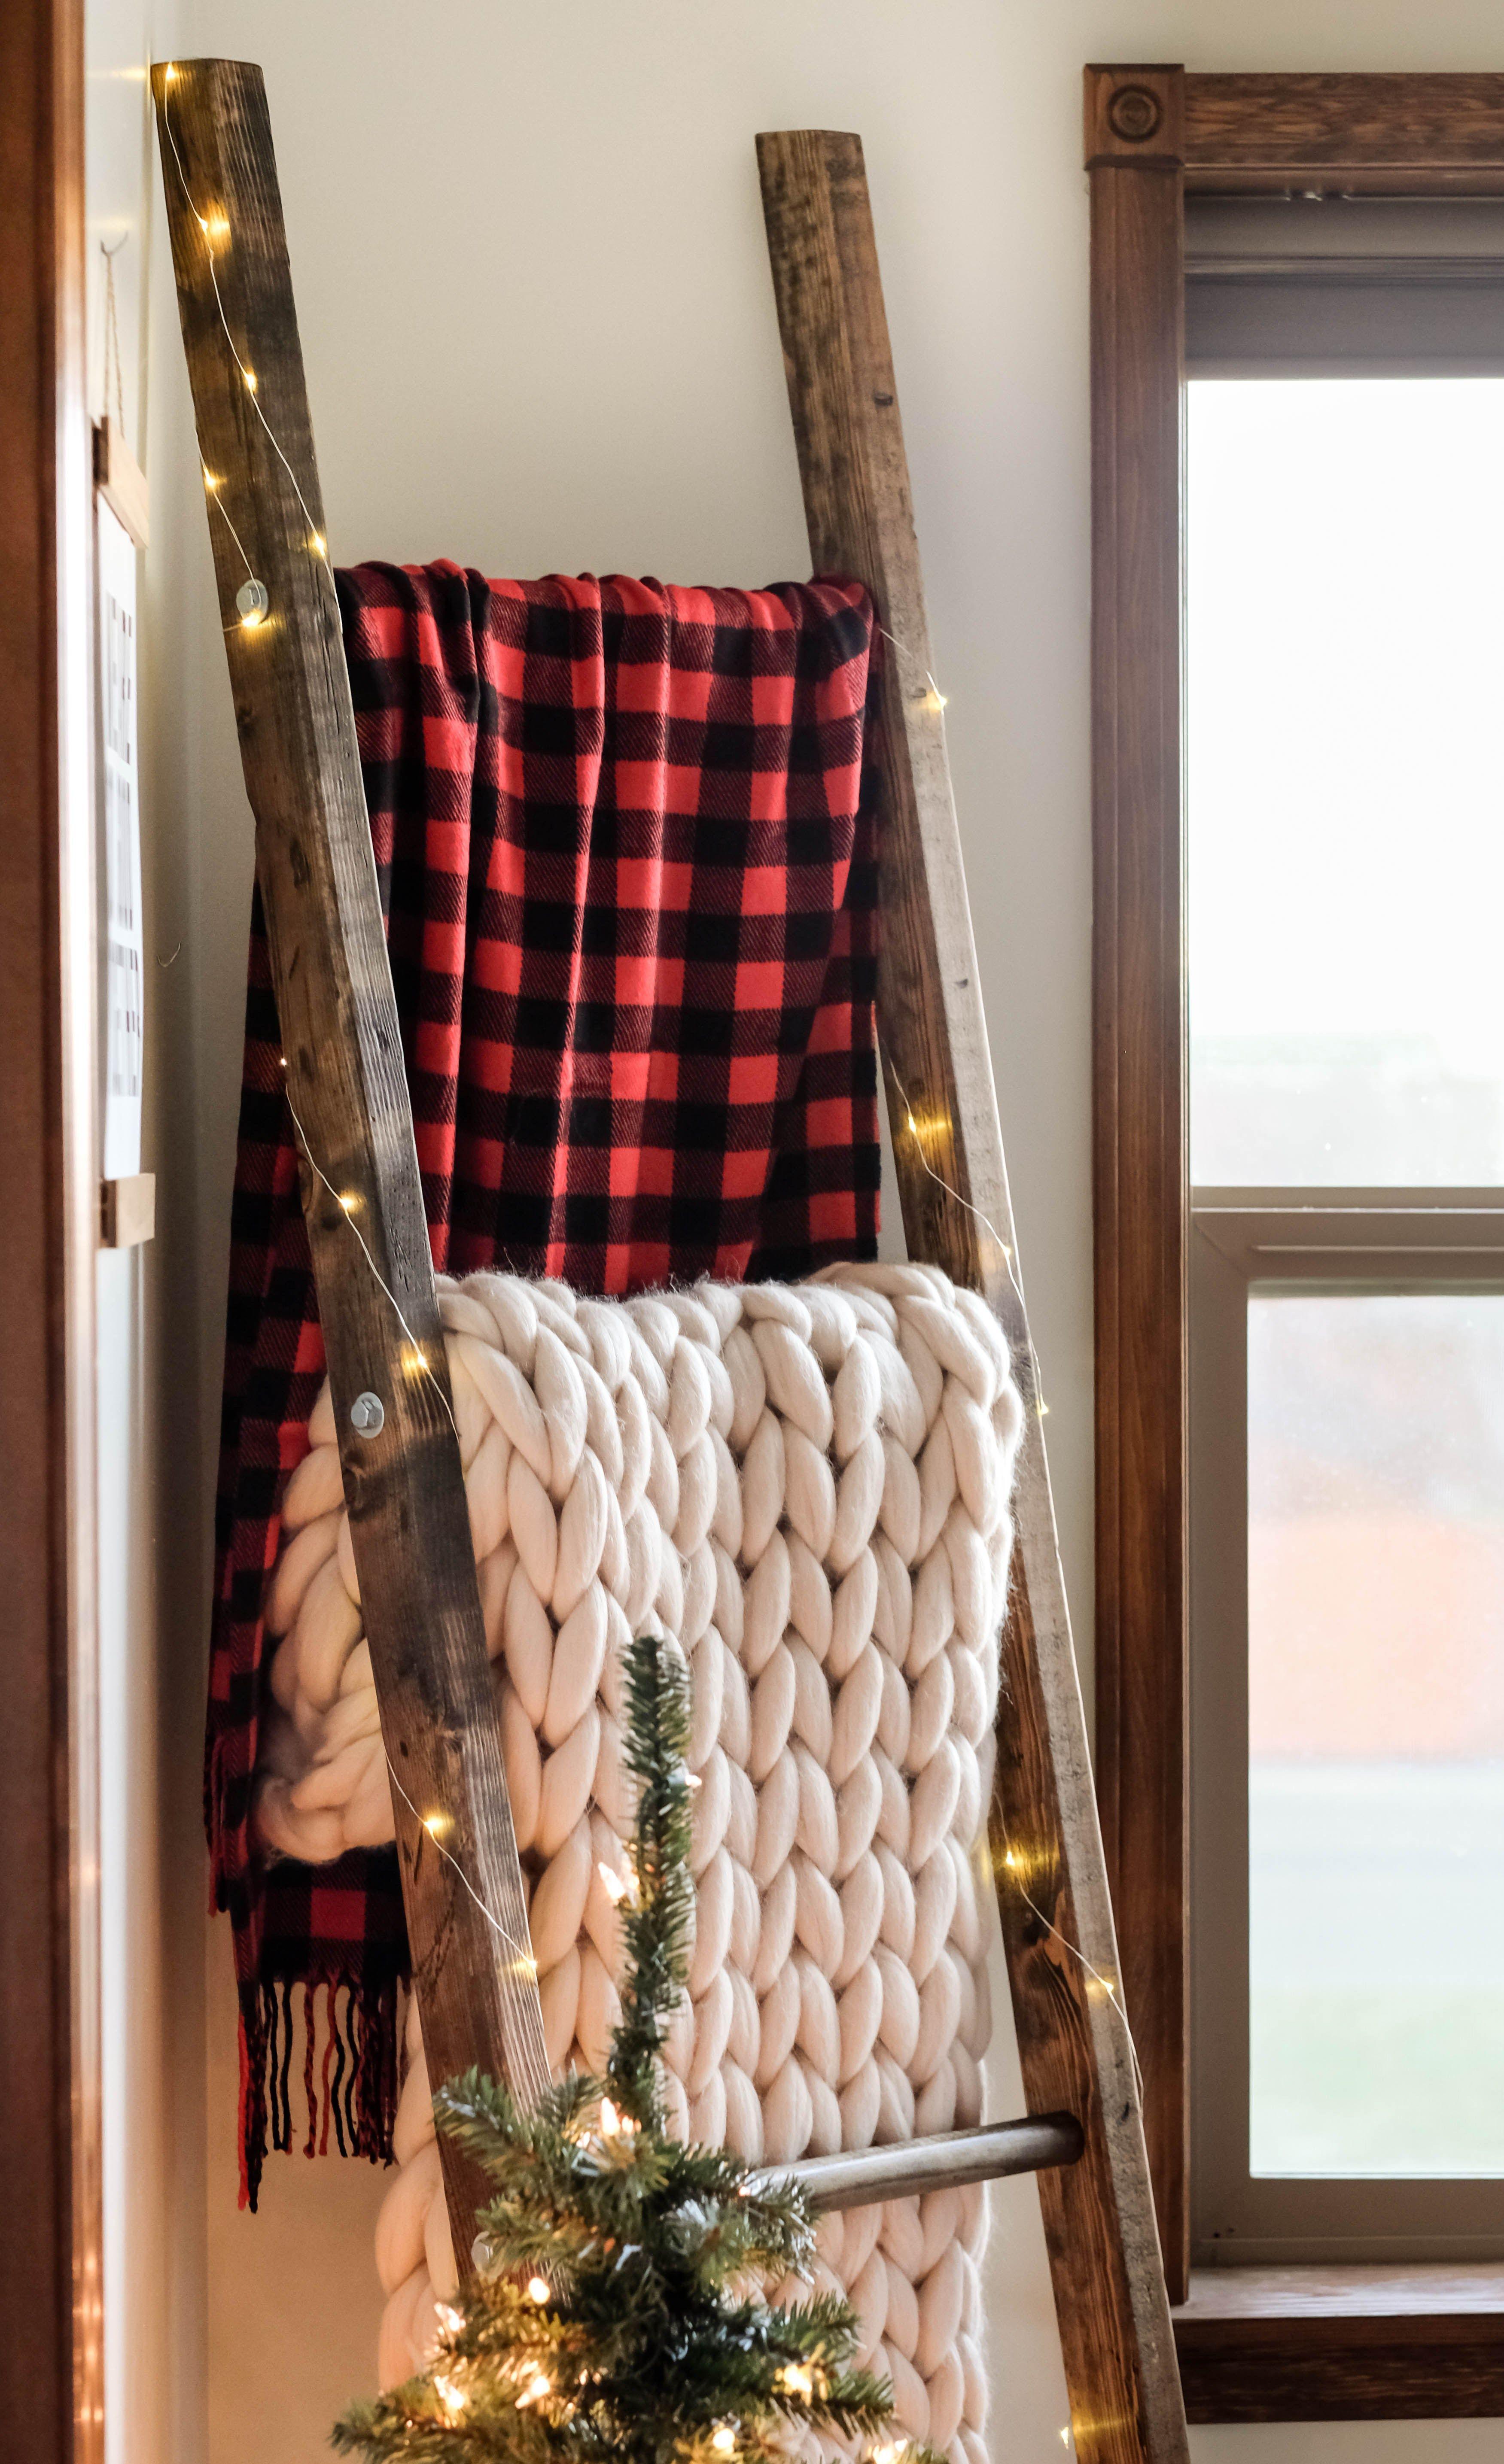 Easy DIY Blanket Ladder for under $15! (Step-By-Step Guide) #homedecorideas